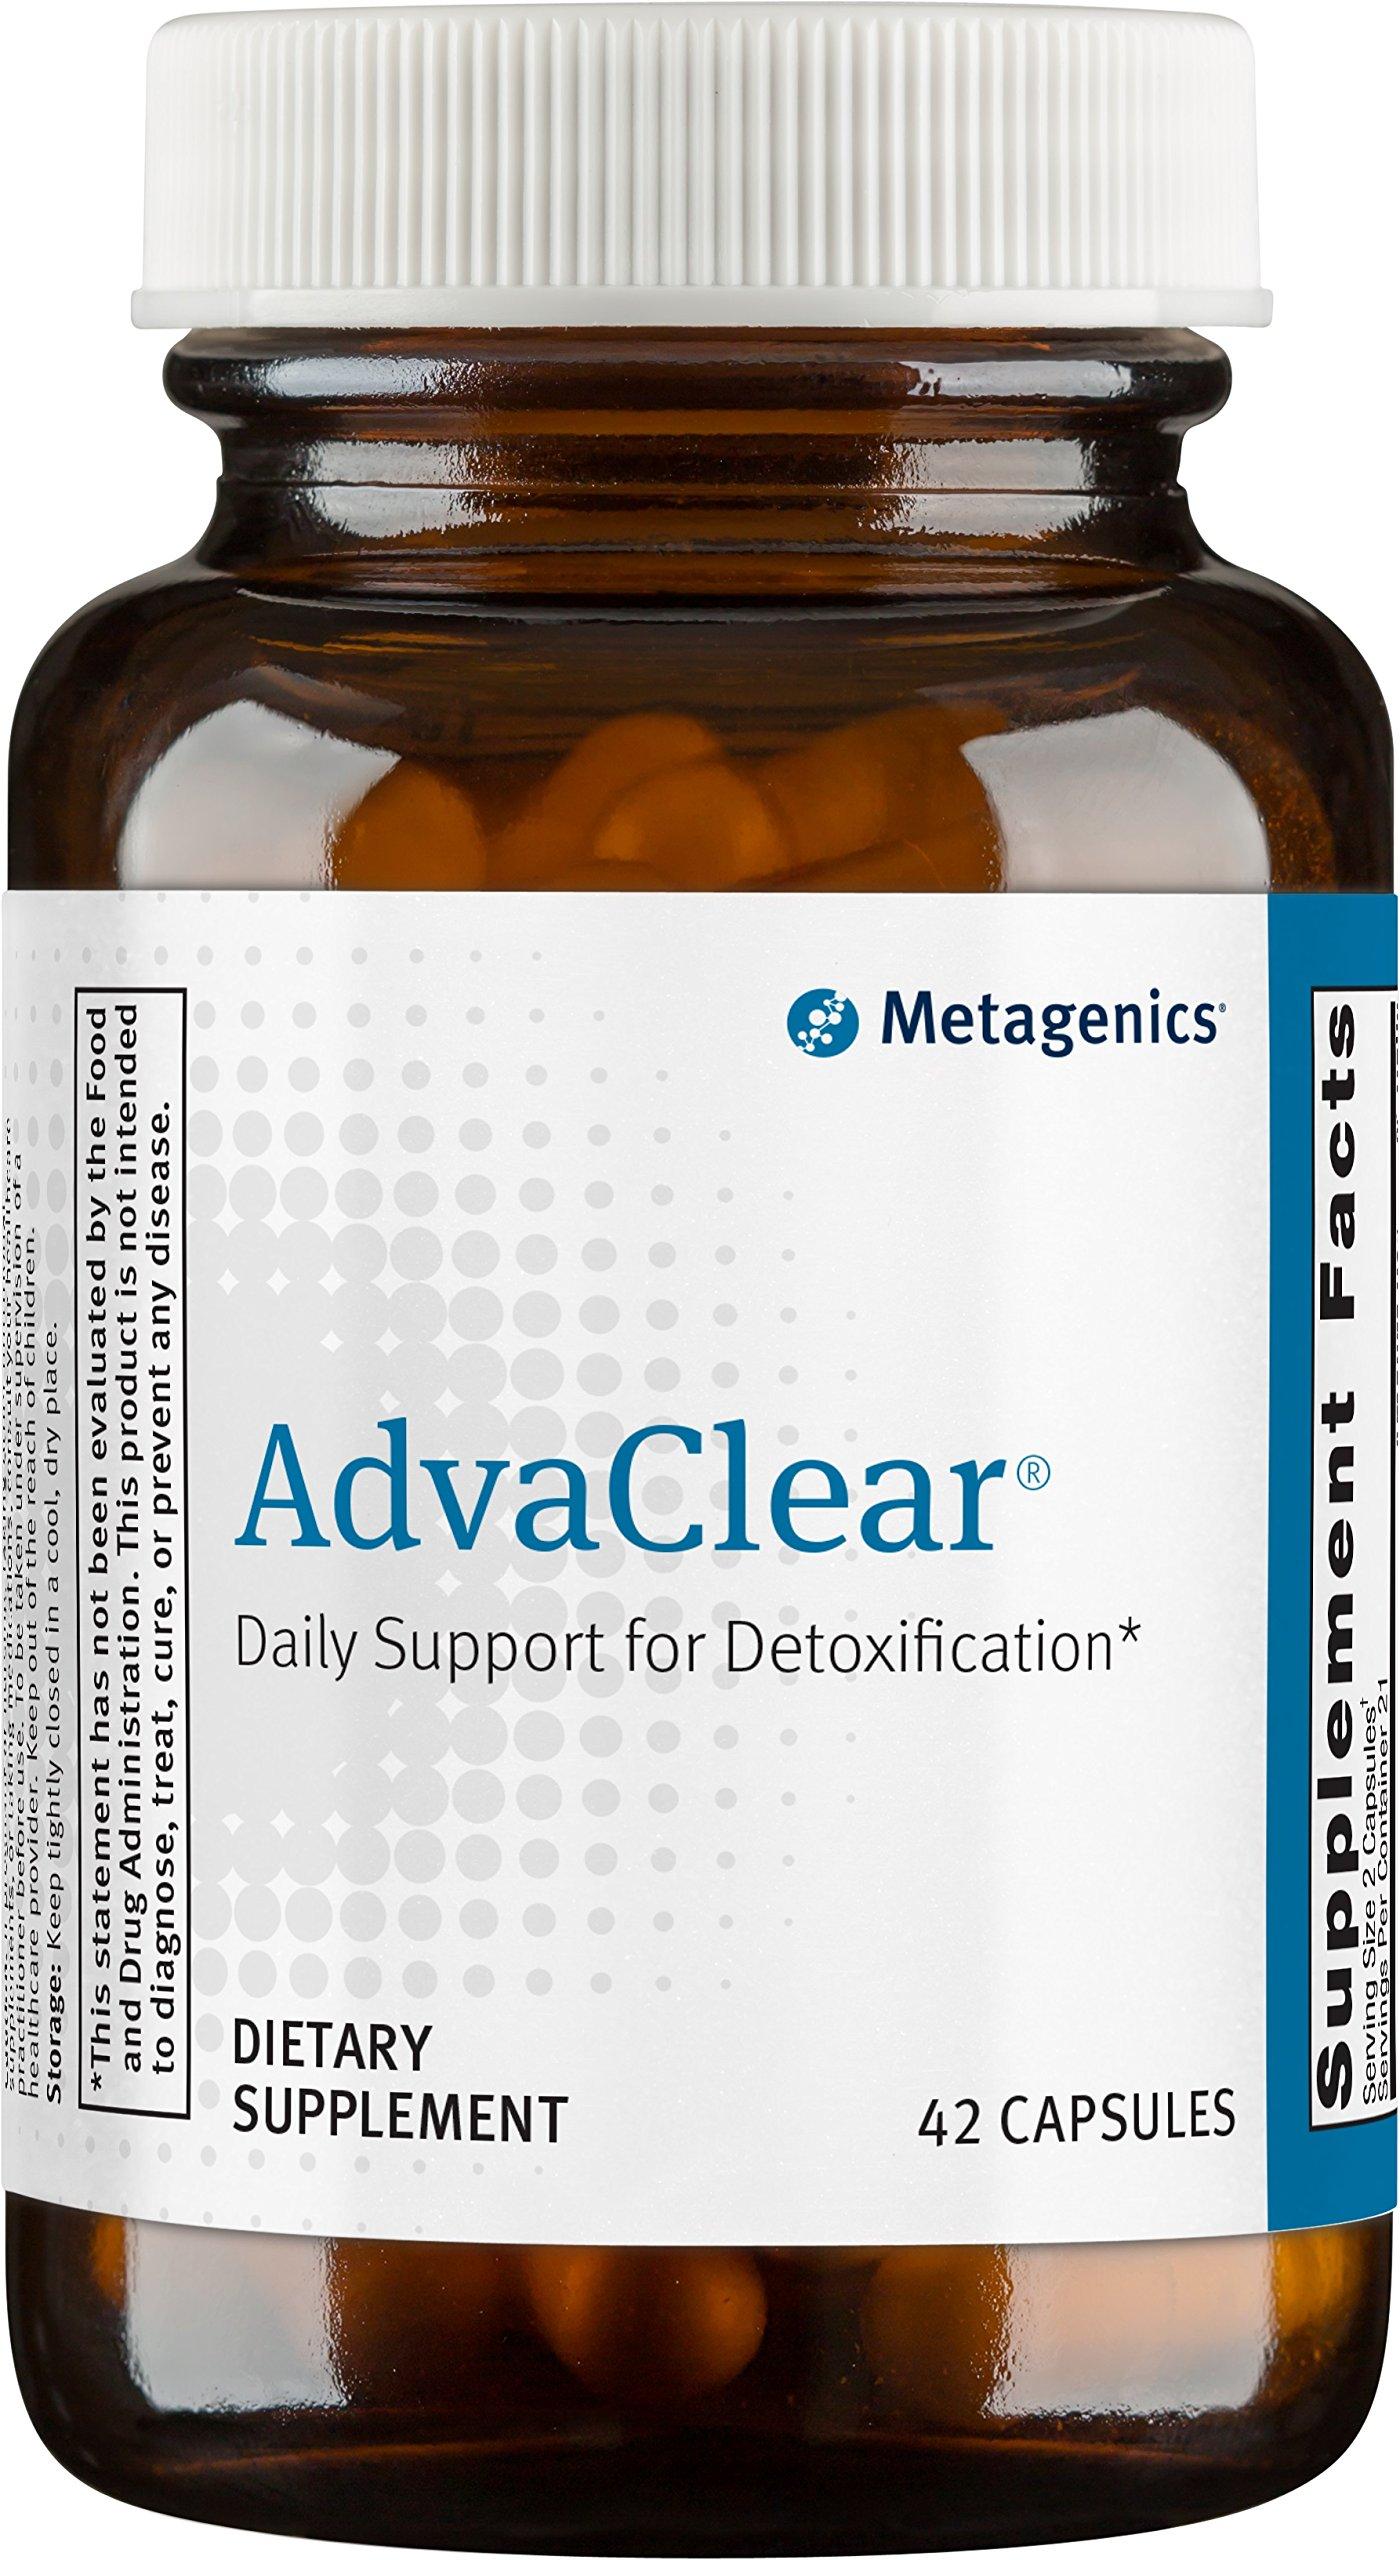 Metagenics - AdvaClear, 42 Count